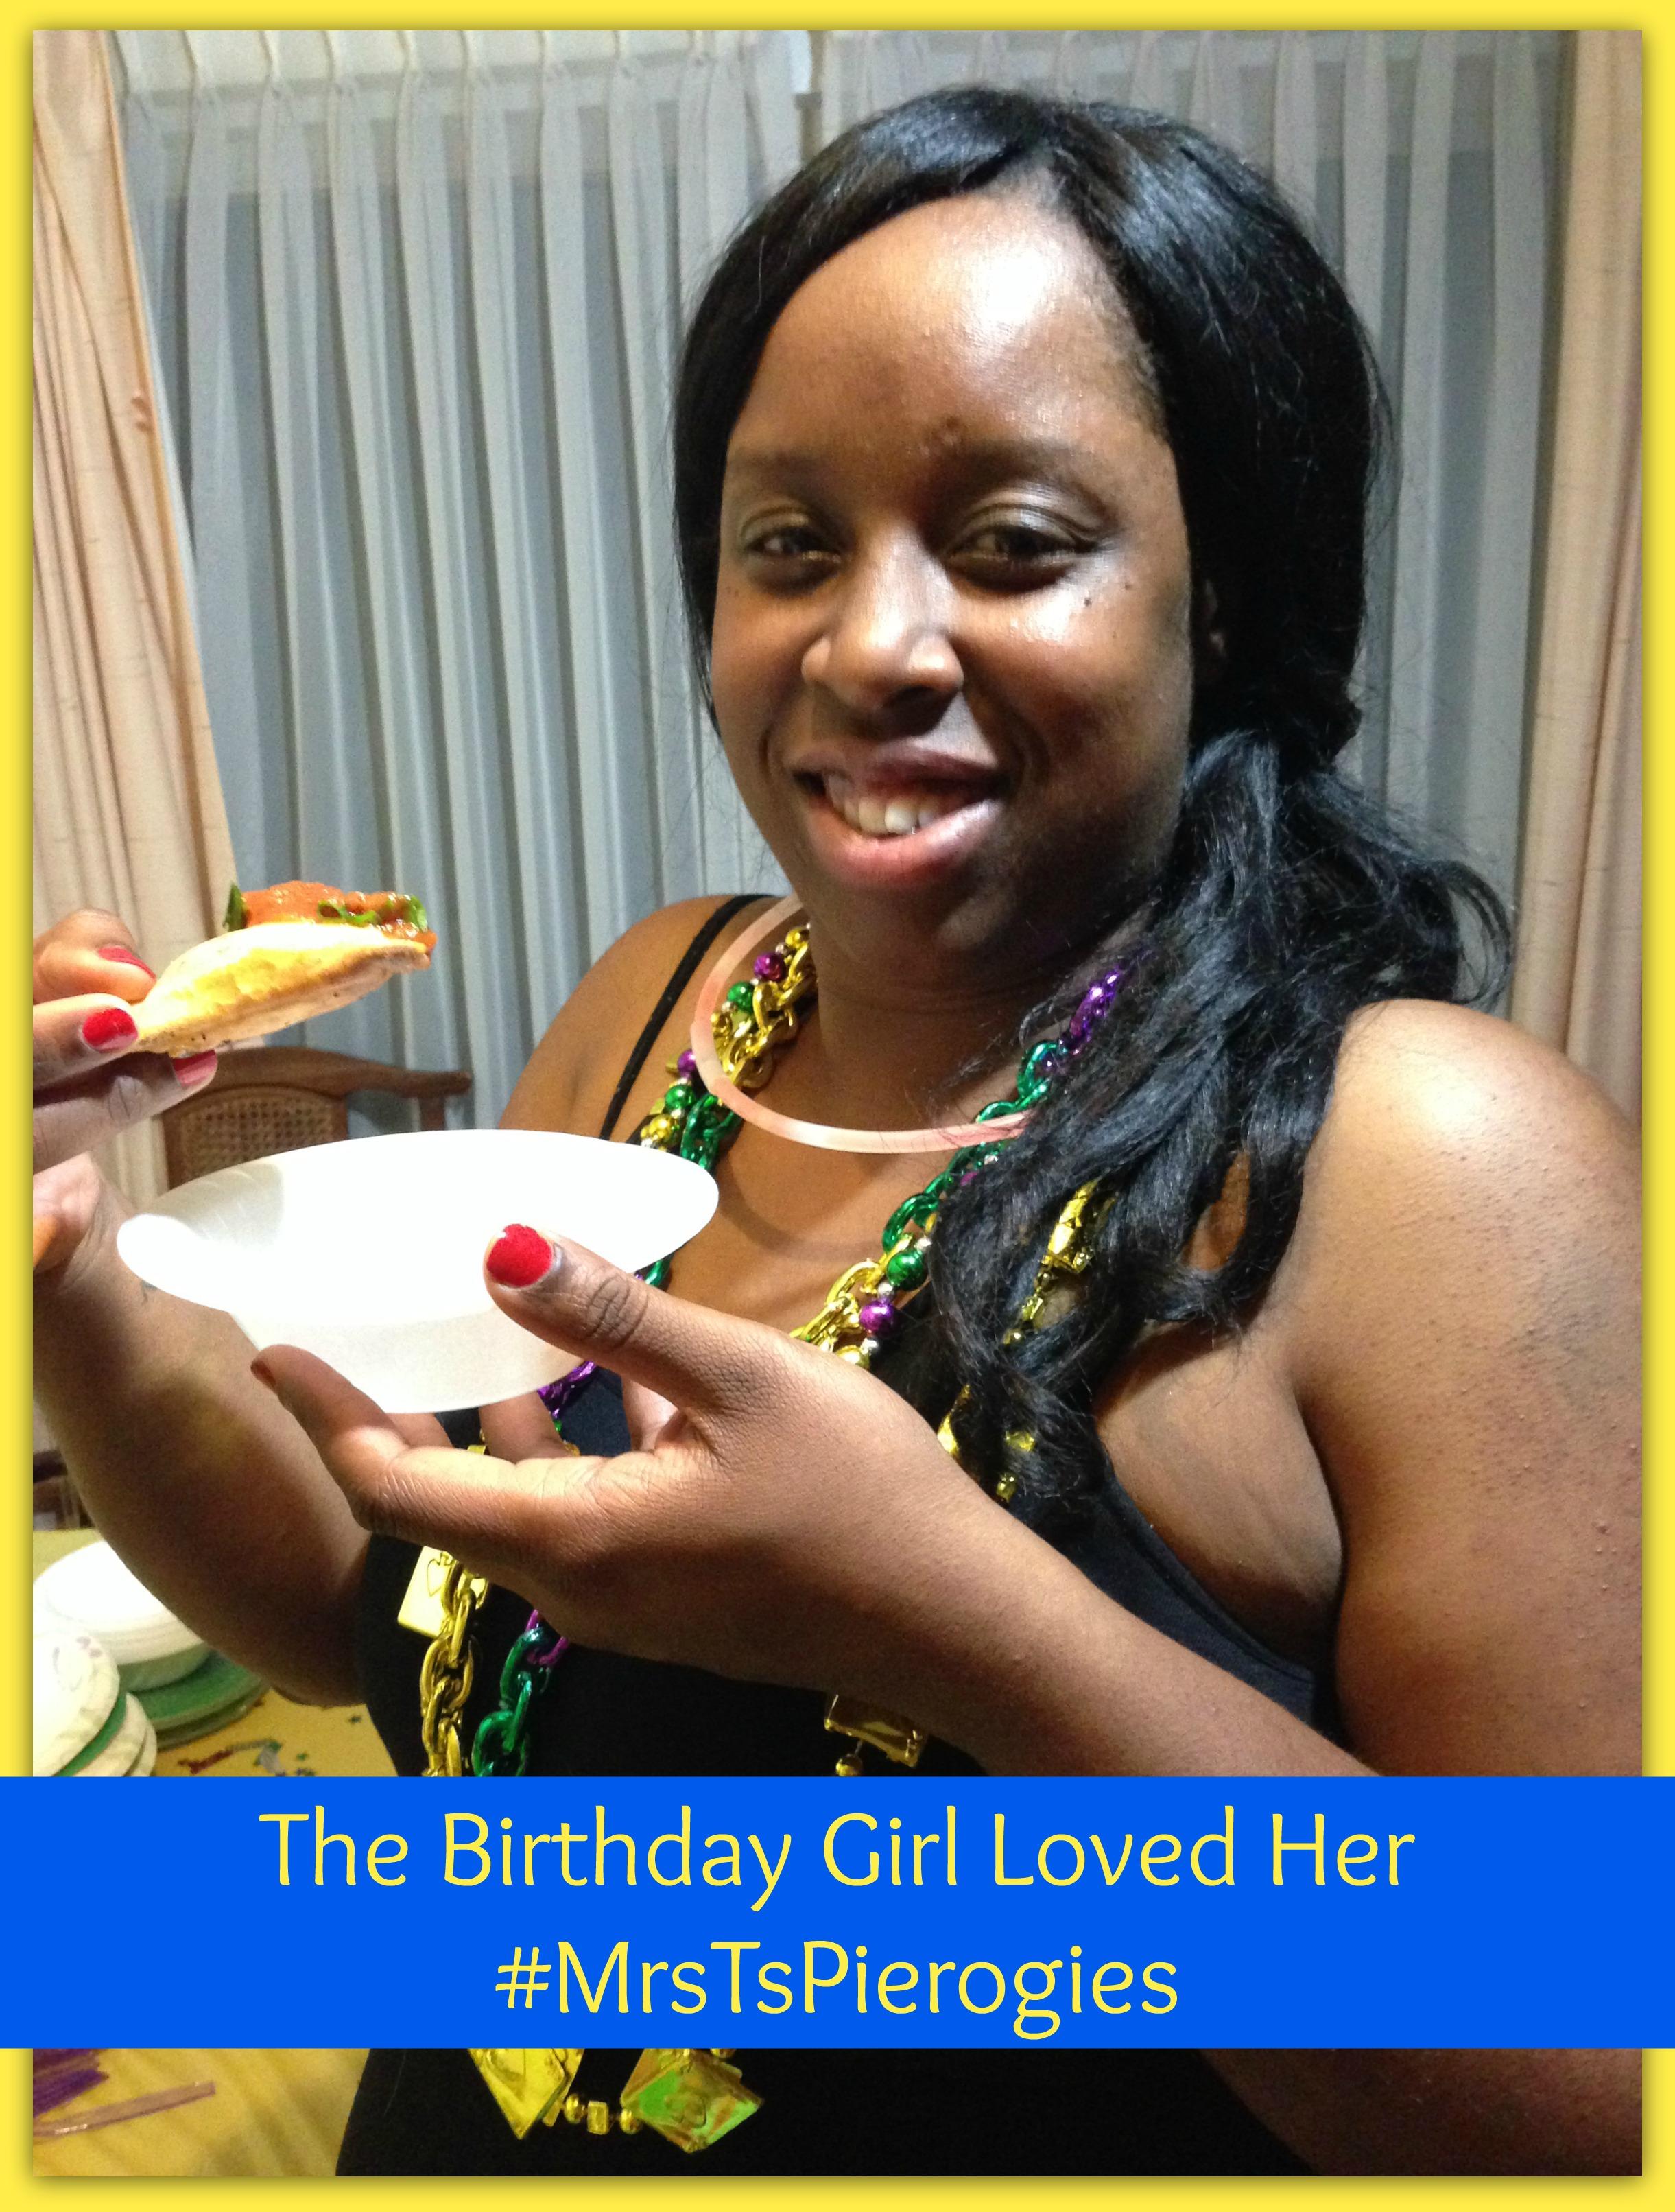 #sponsored #ad #MrsTsPierogies Birthday Girl